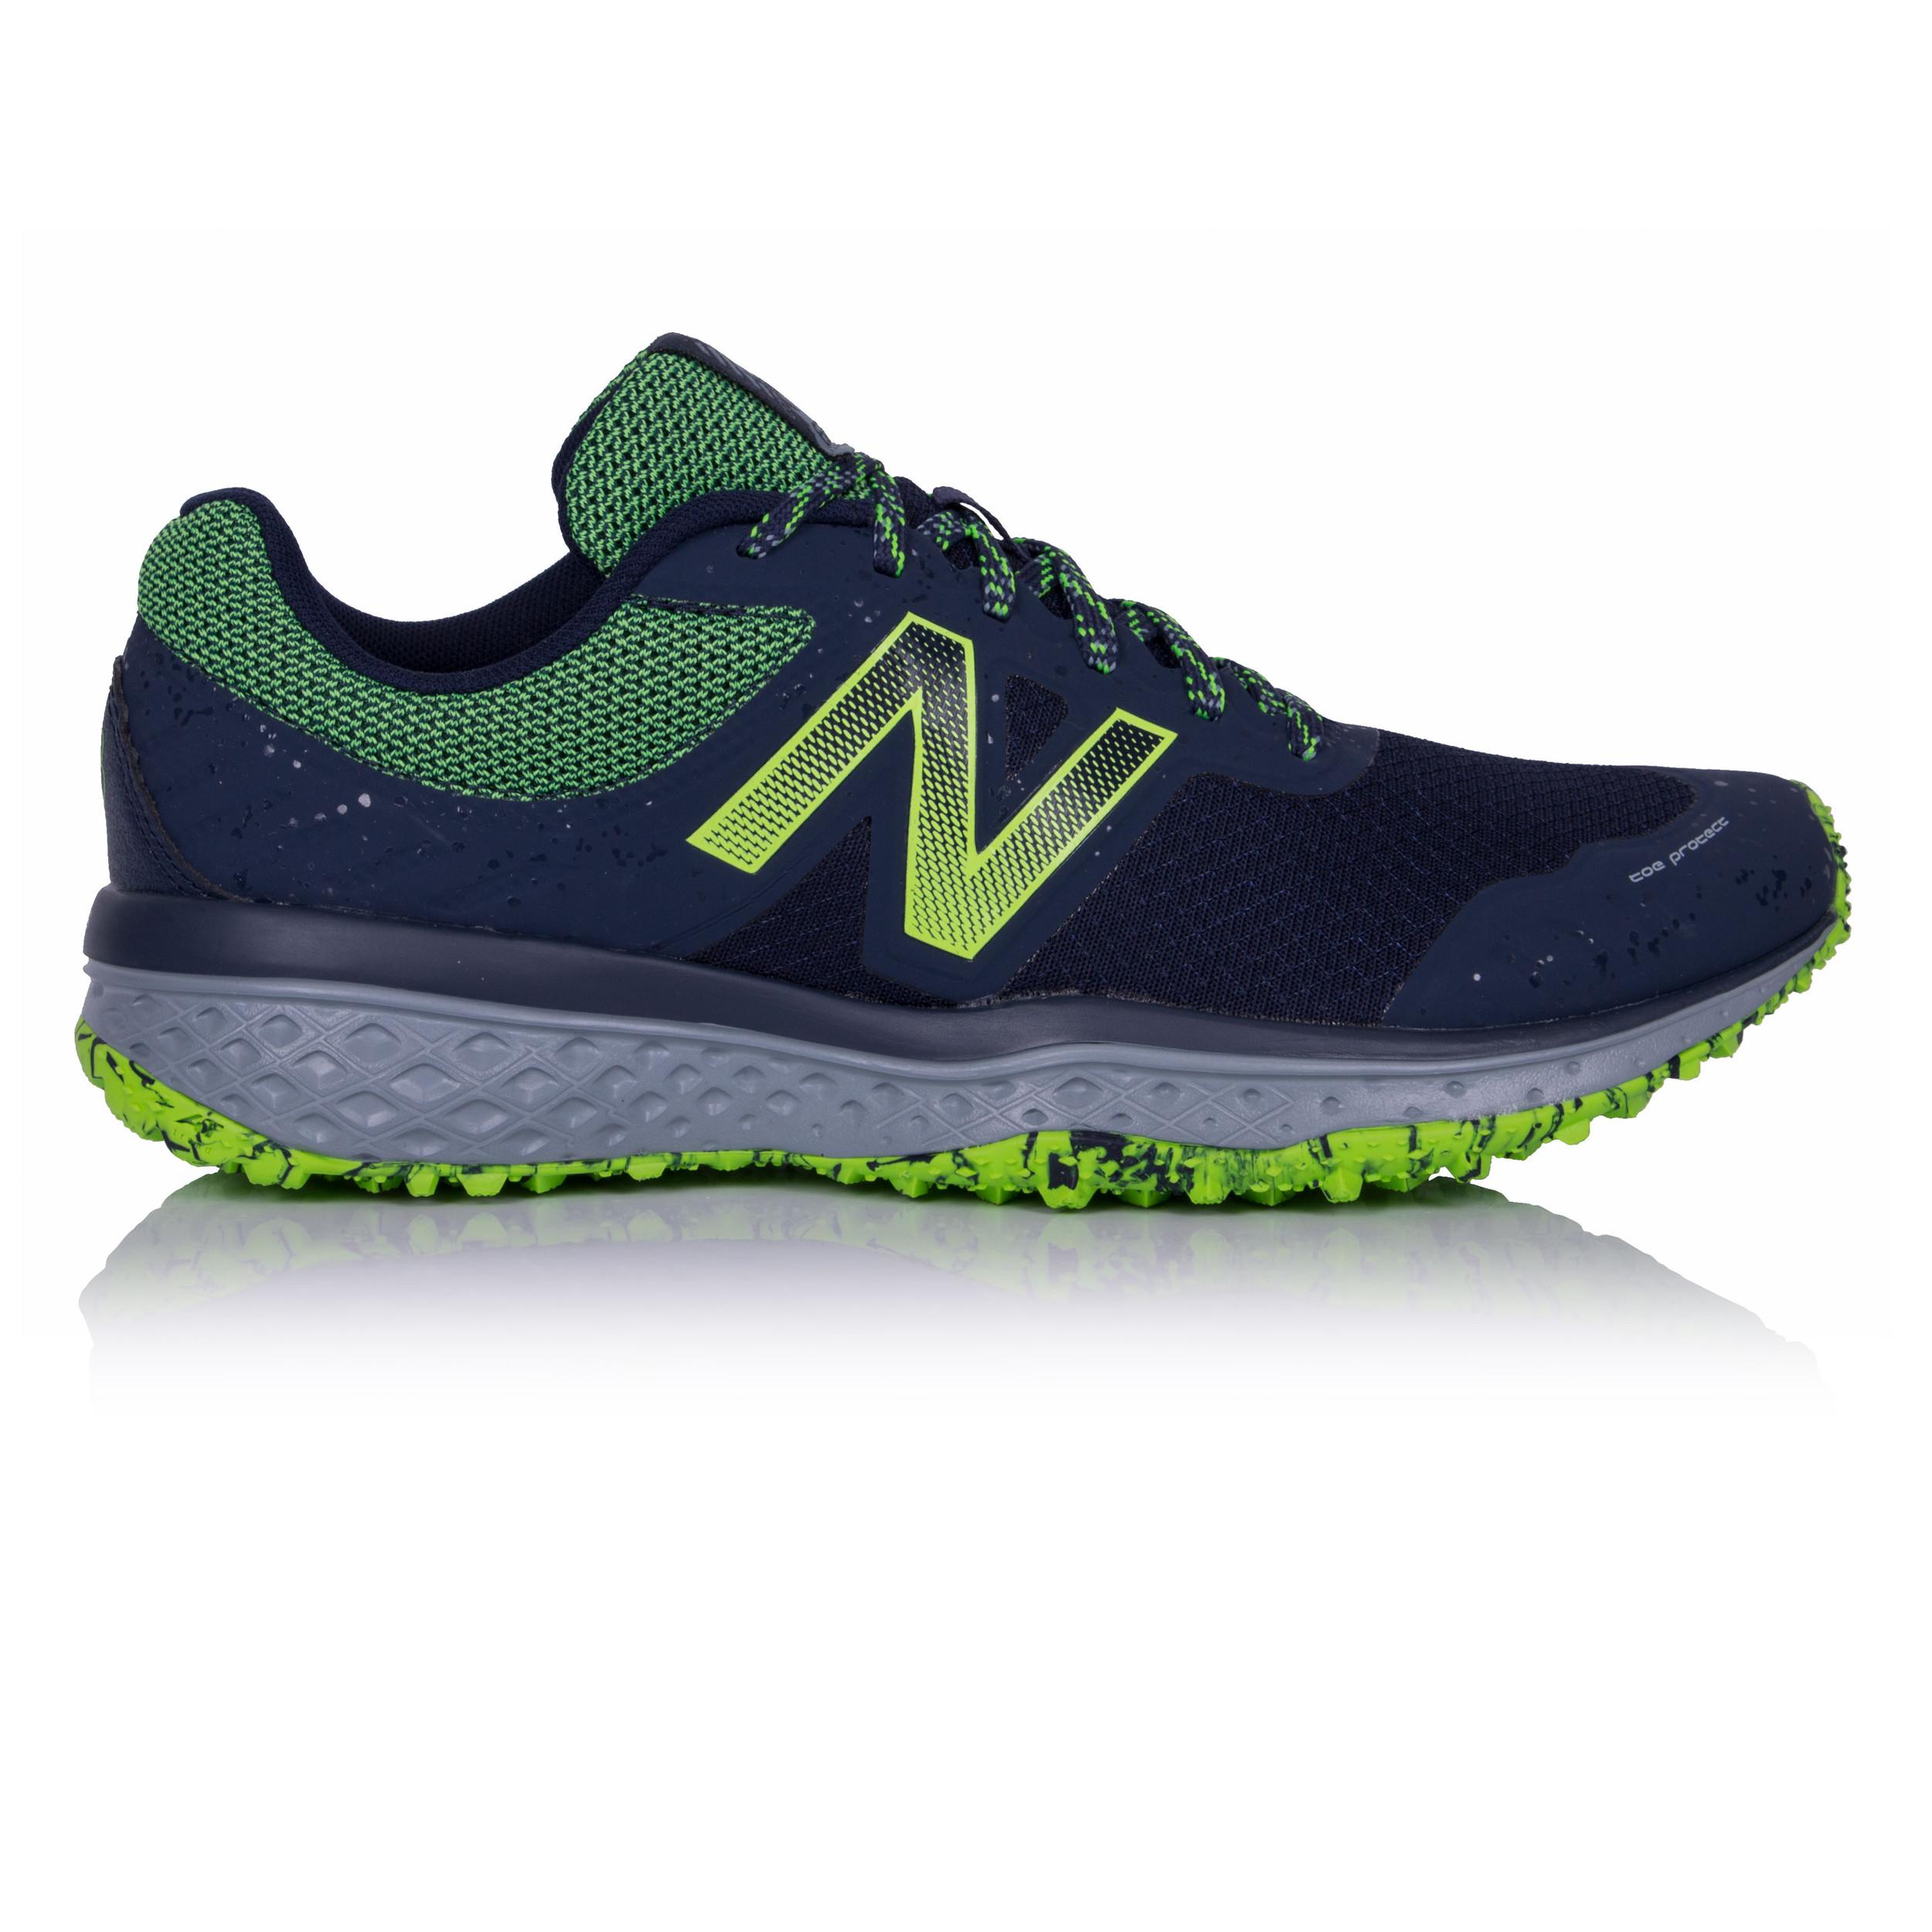 New Balance Uomo Blu Verde MT620v2 Trail Scarpe Da Corsa Ginnastica Sport